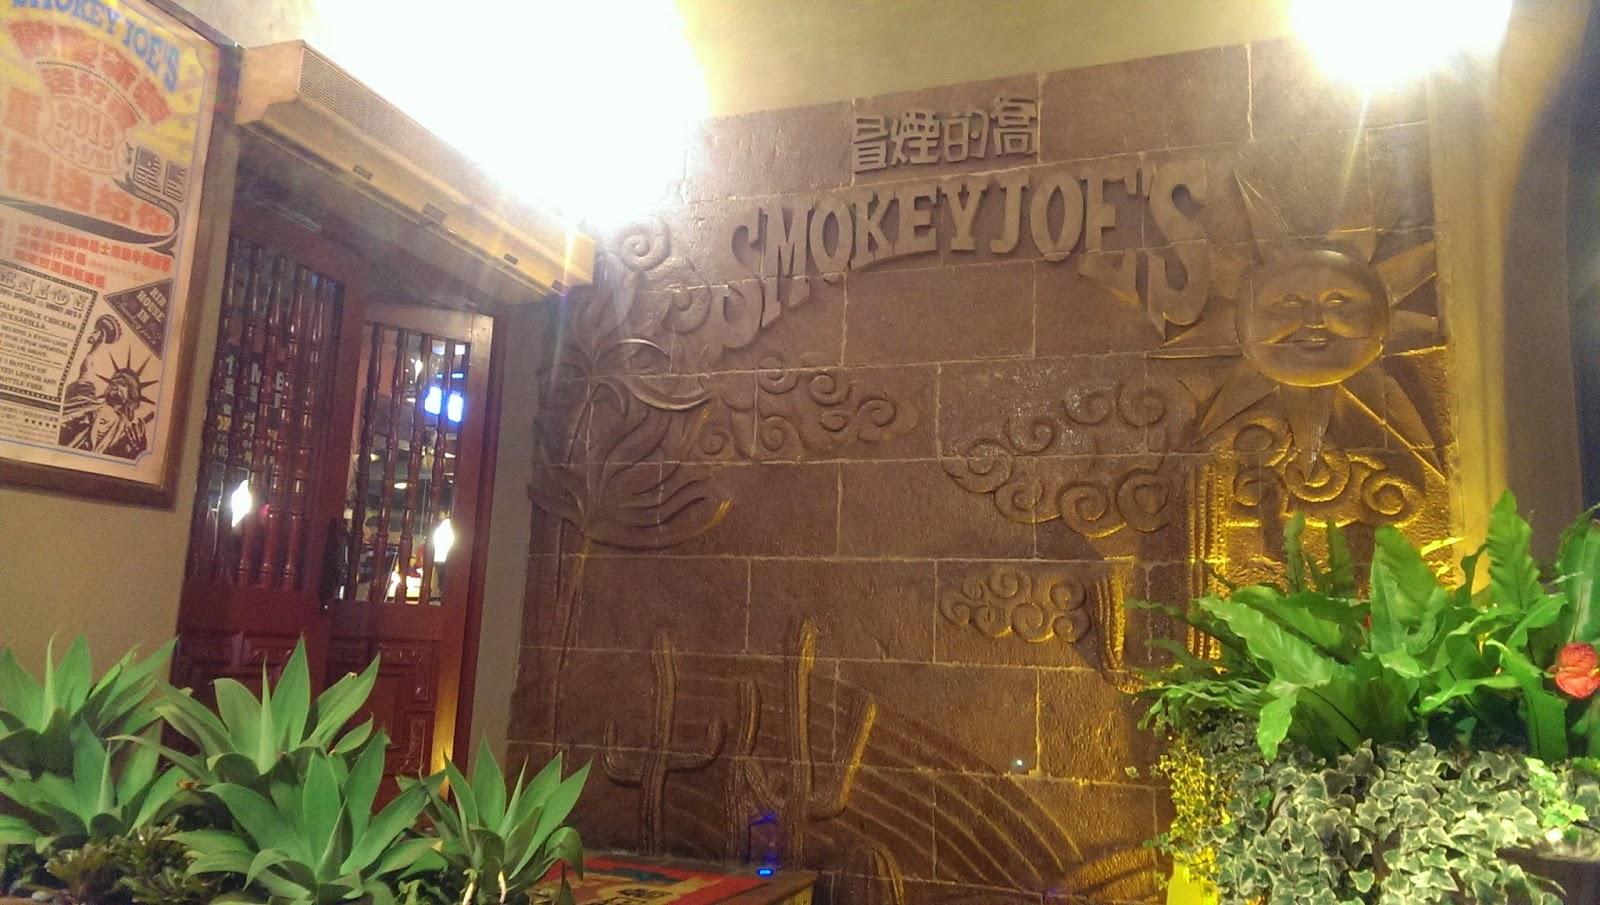 2015 01 24%2B18.27.47 - [食記] Smokey Joe's 冒煙的喬 高雄左營的美式墨西哥餐廳!